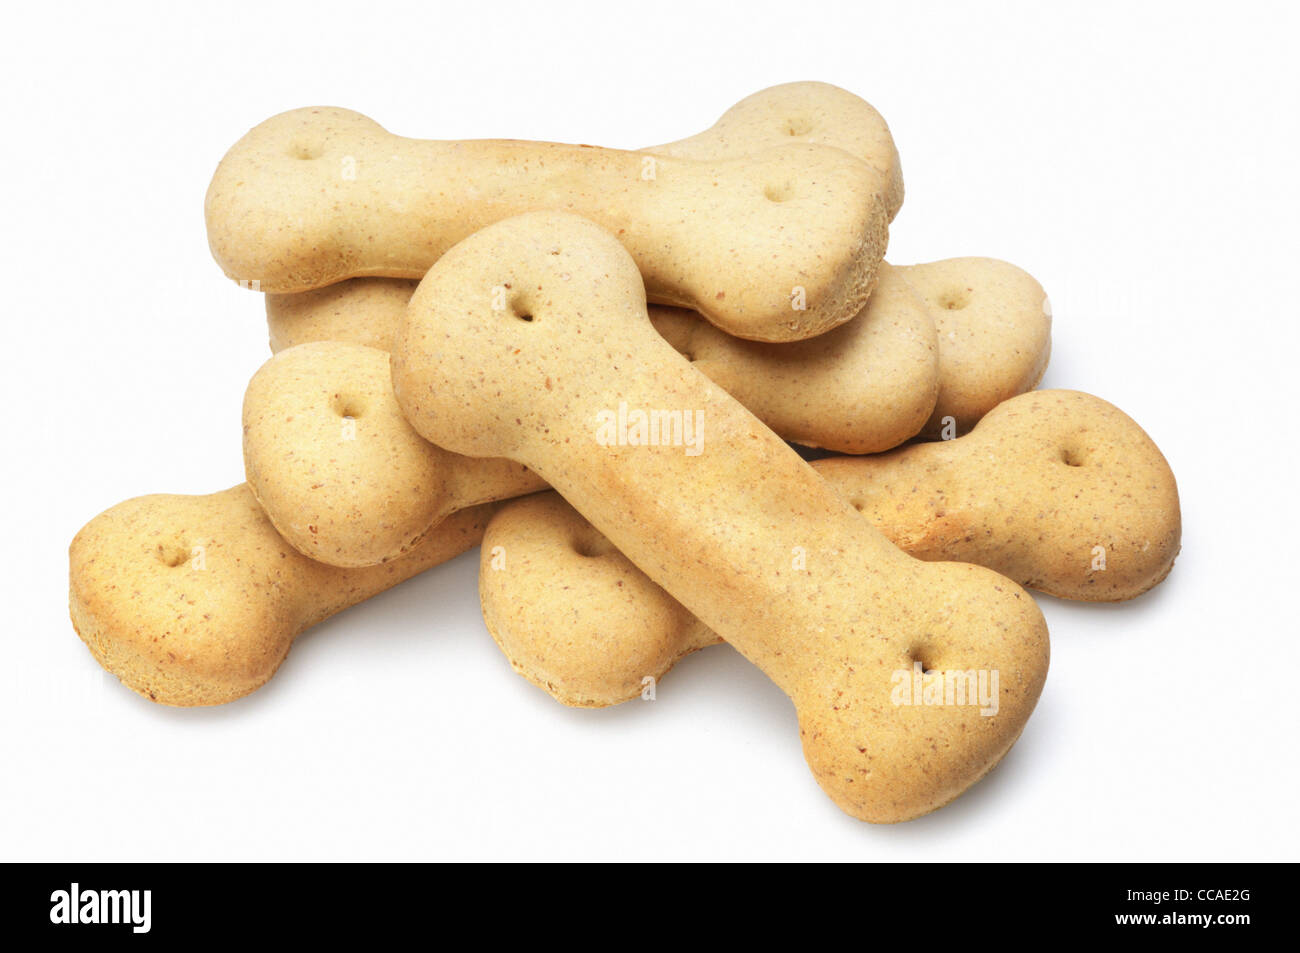 Dog Biscuit - John Gollop - Stock Image